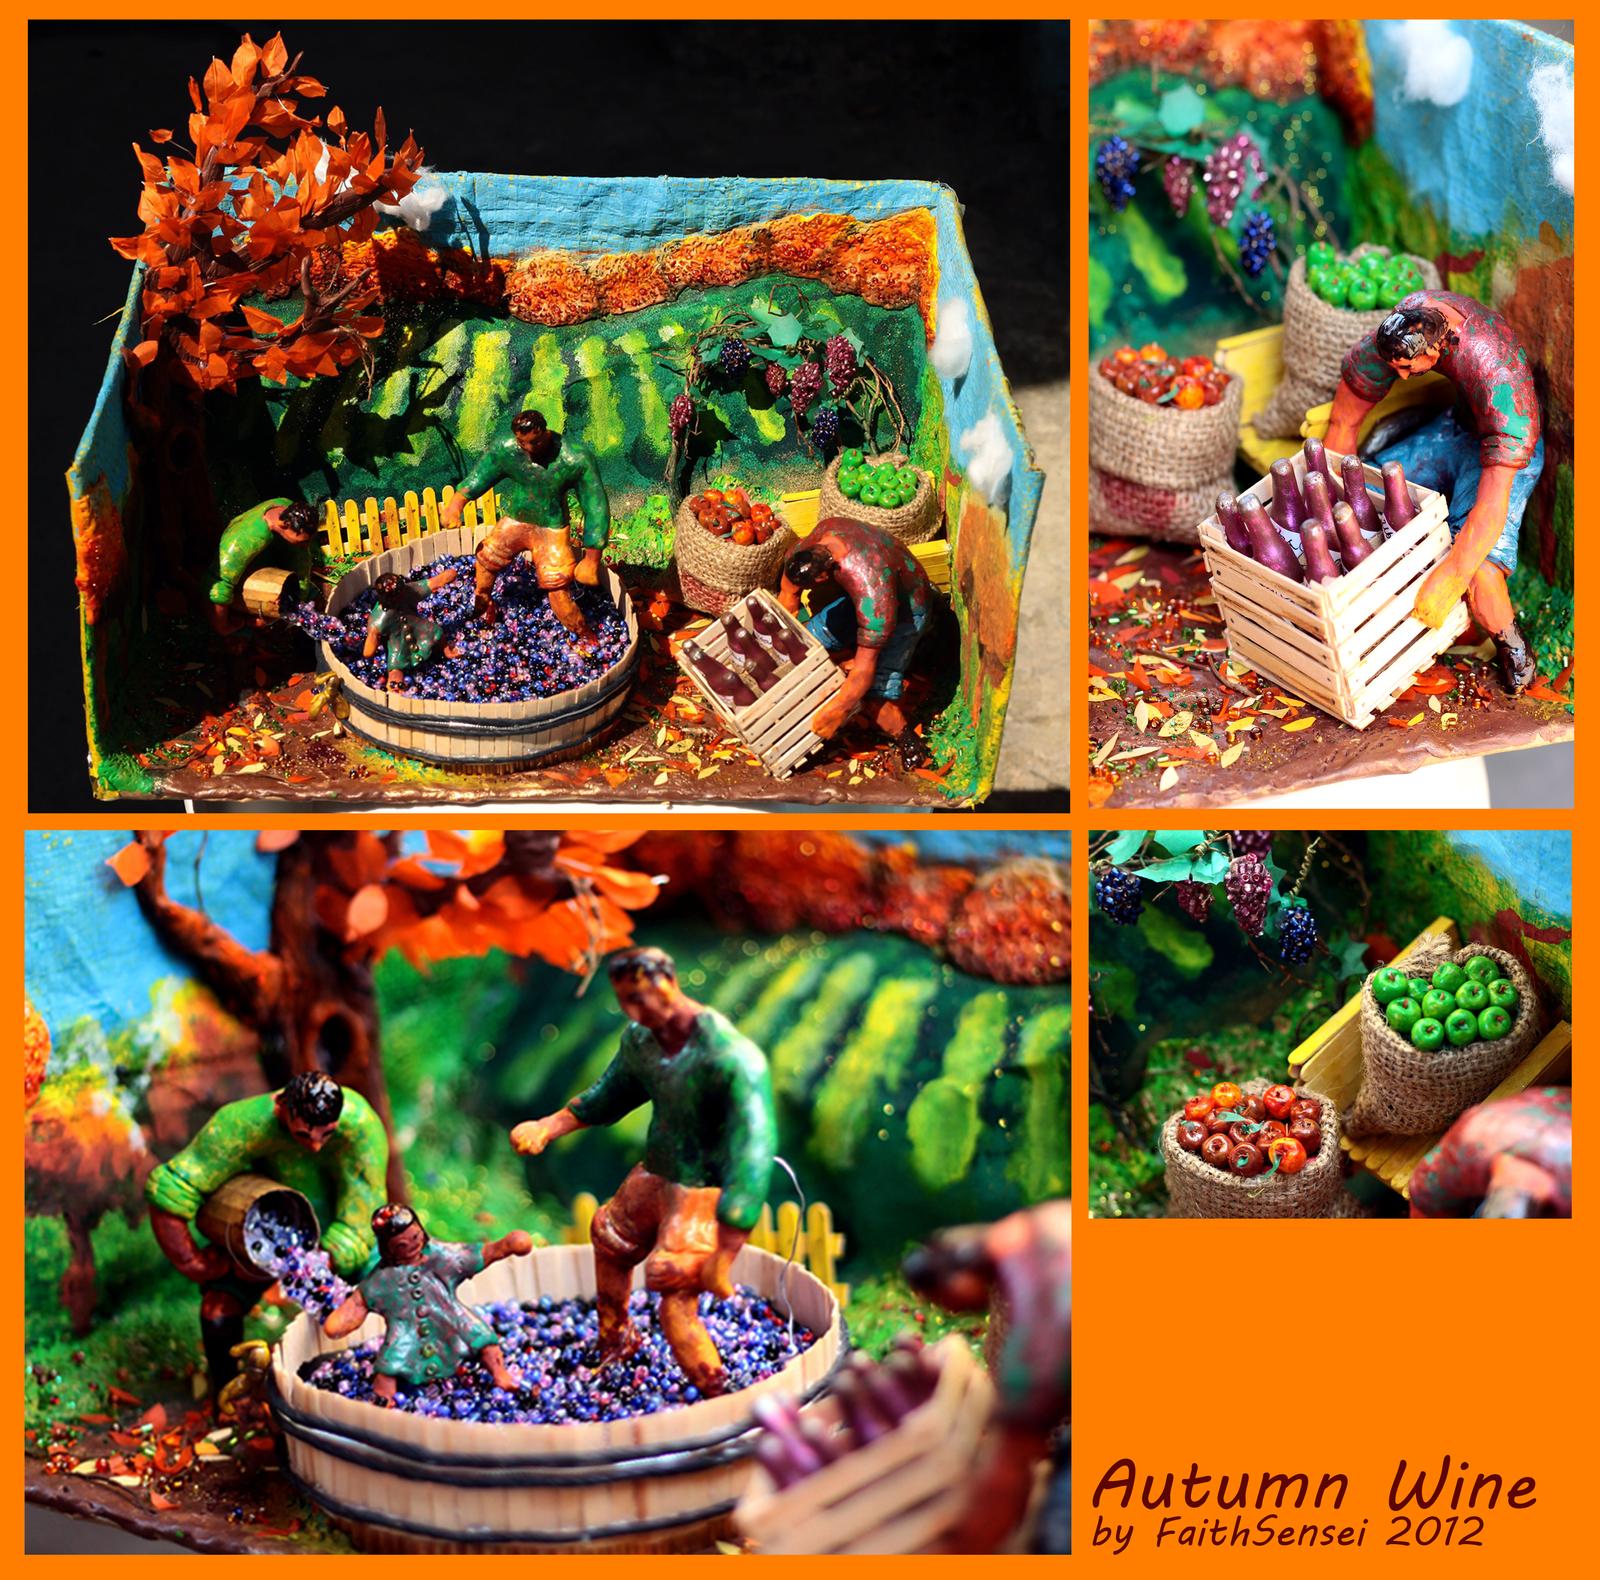 Autumn Wine by FaithSensei